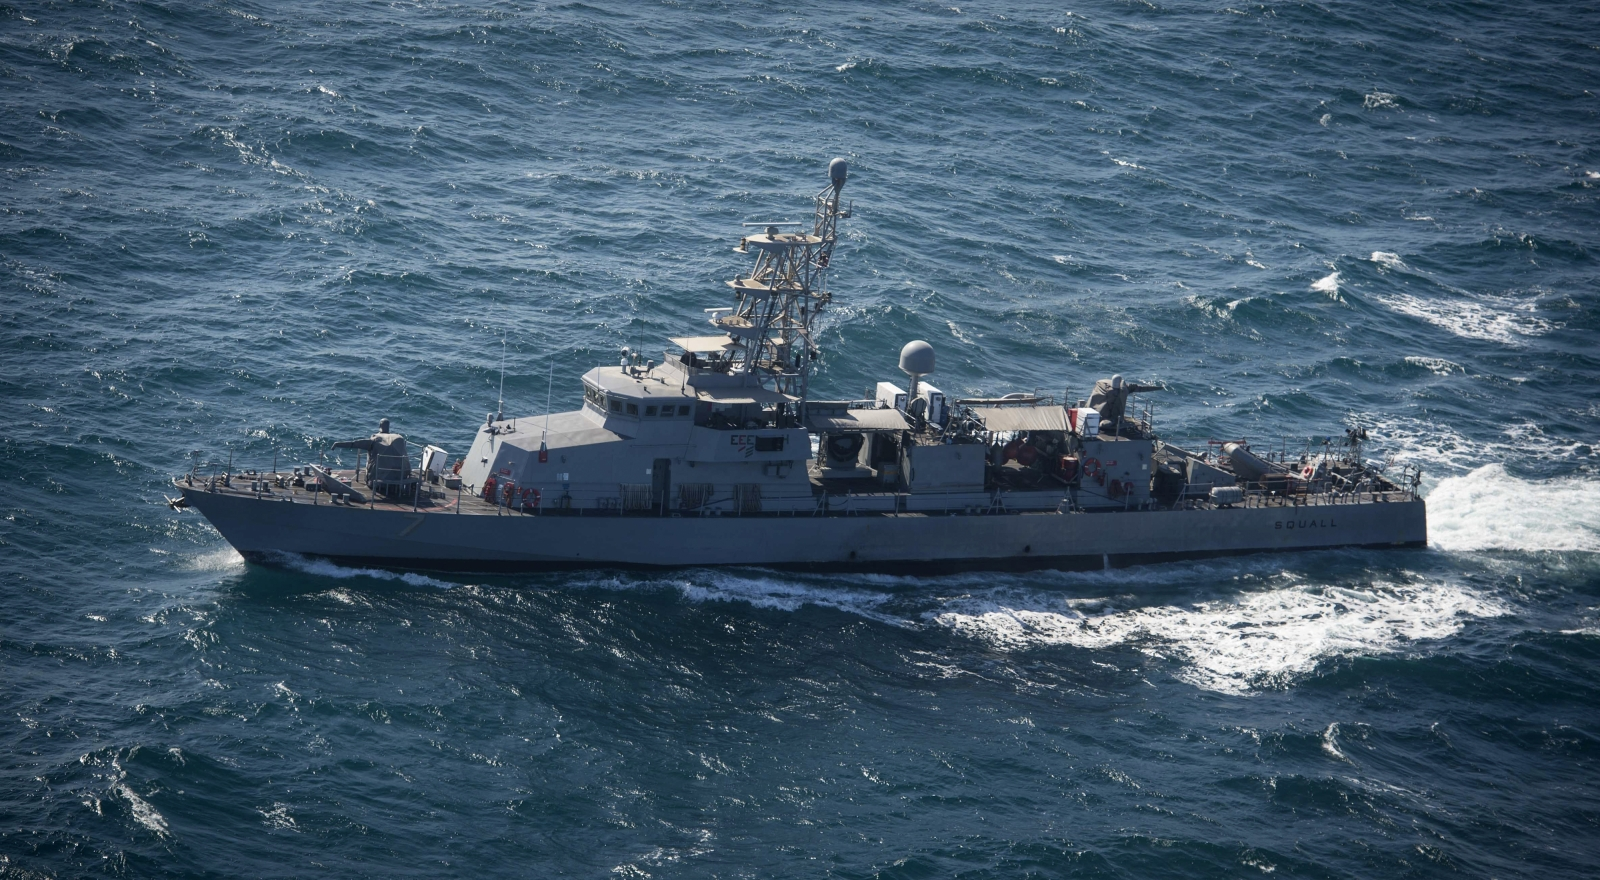 USS Squall iran